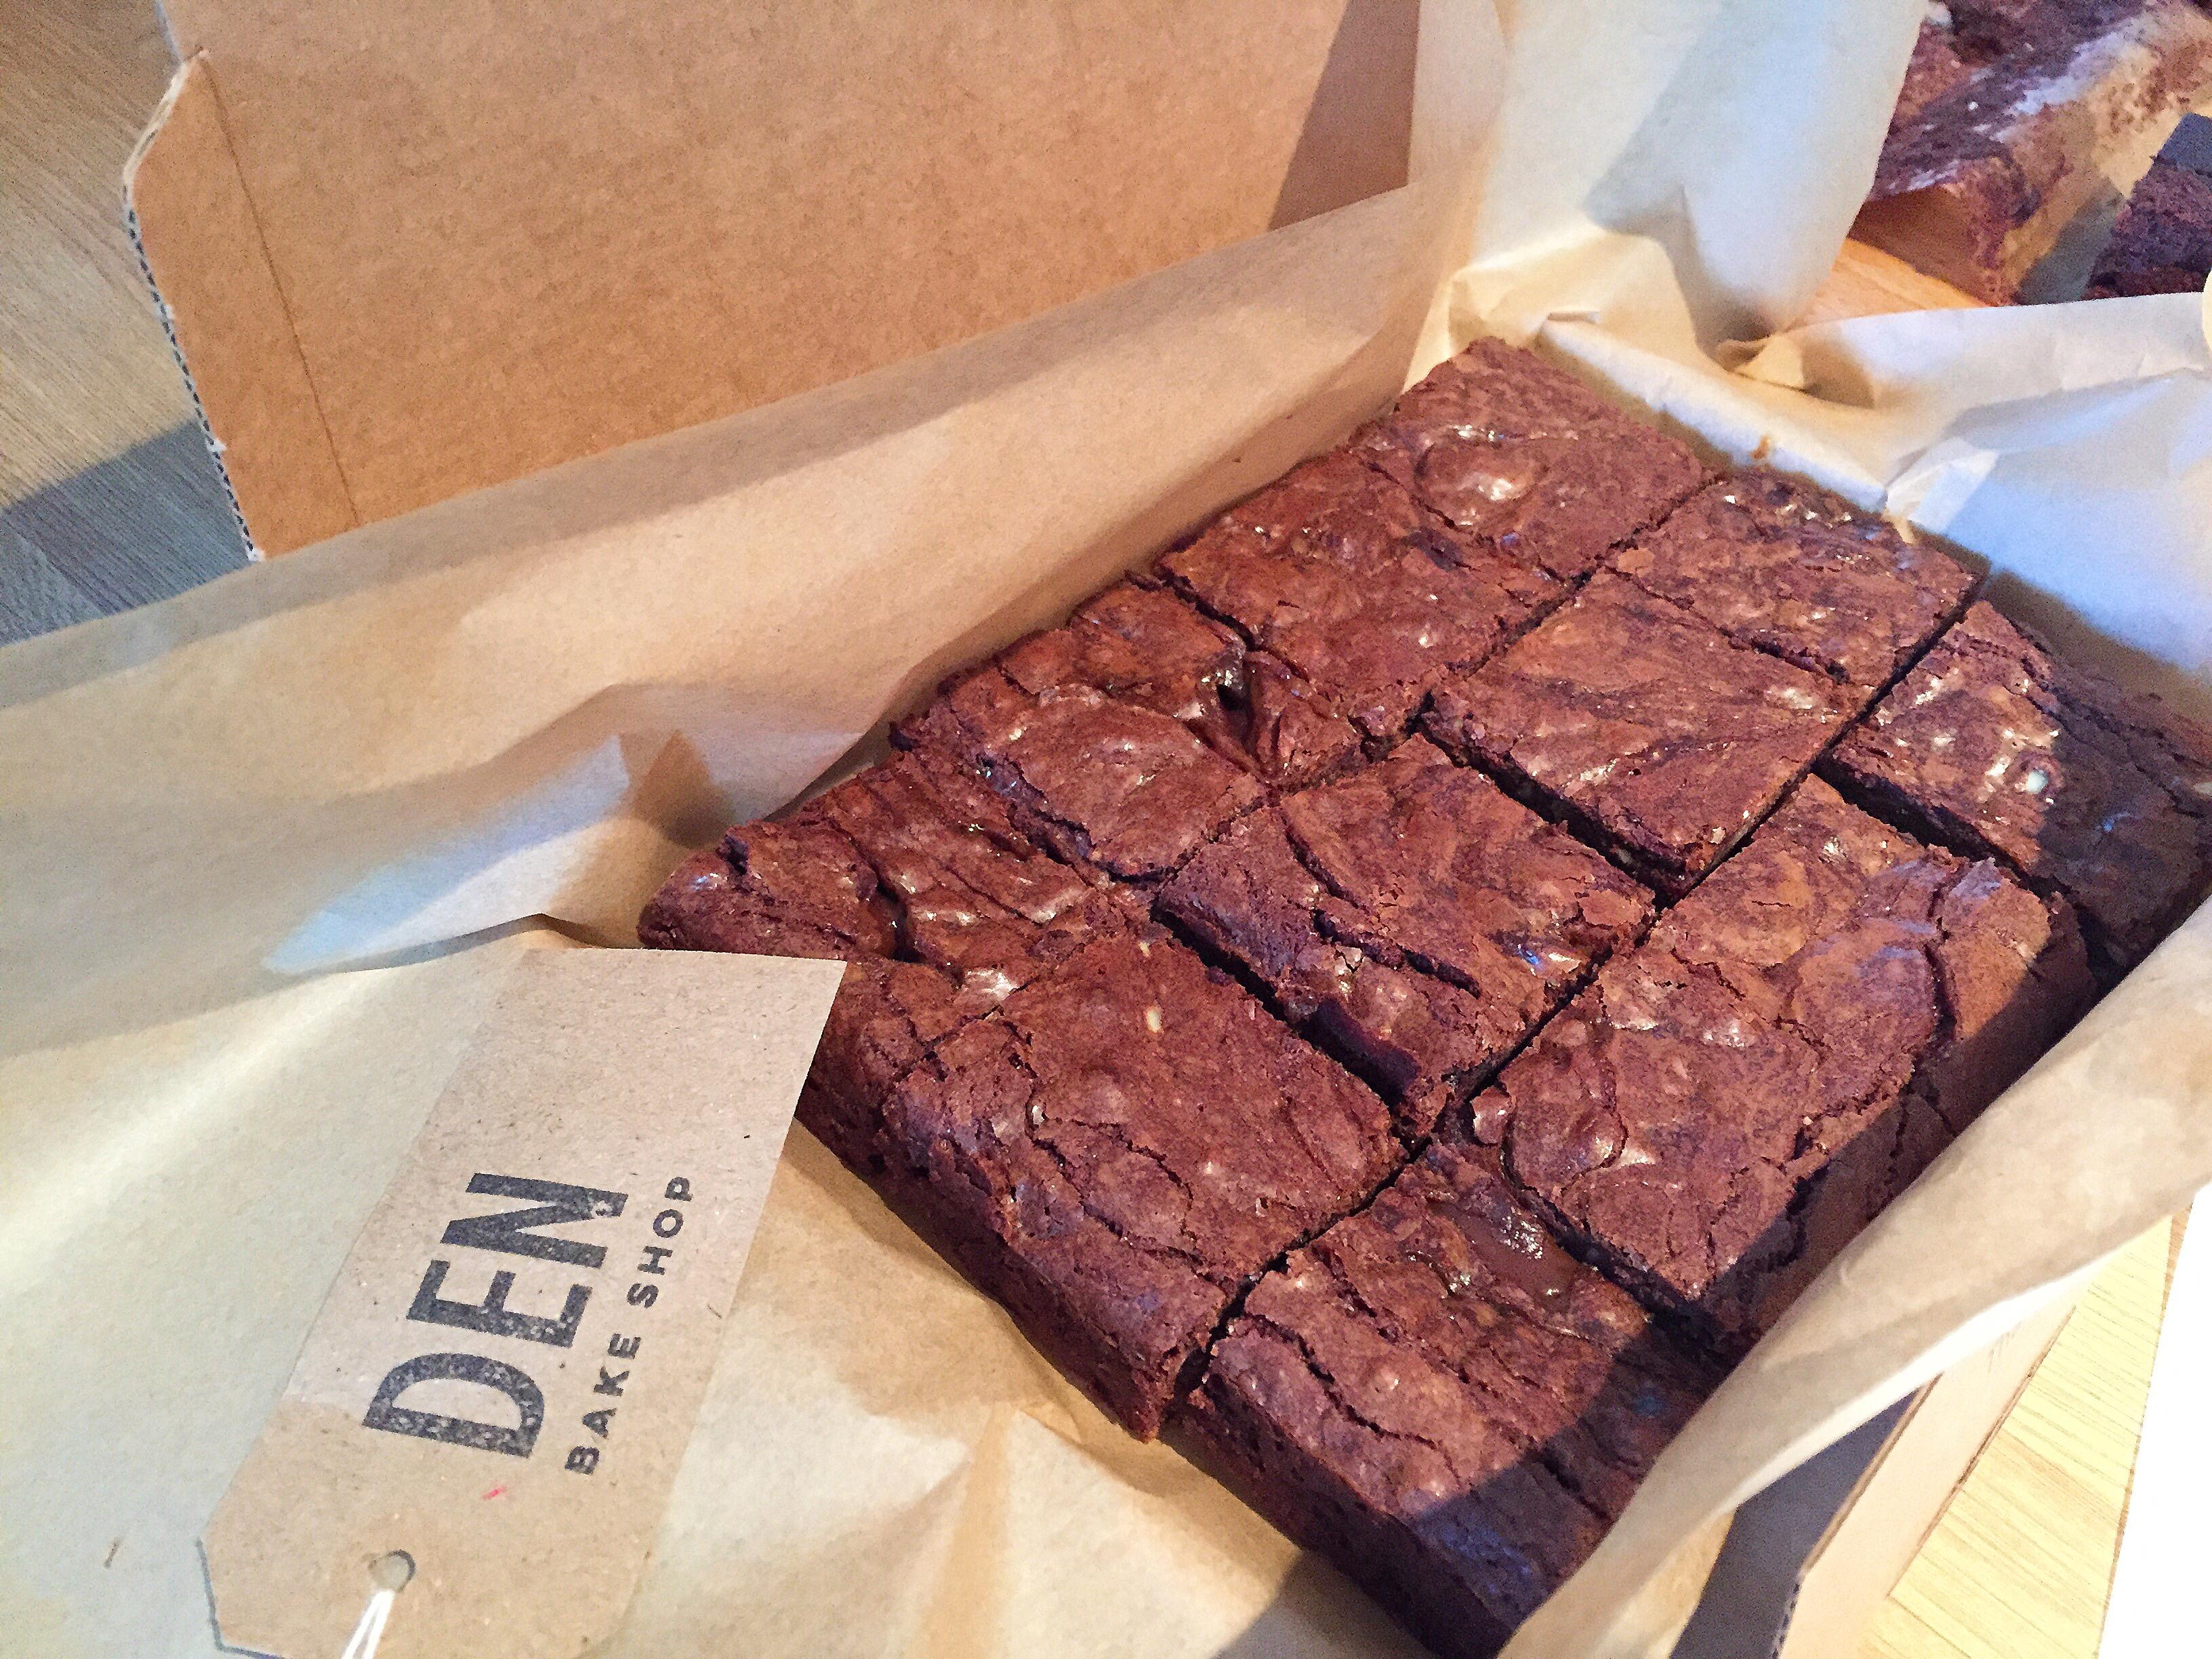 Den Bake Shop brownie box